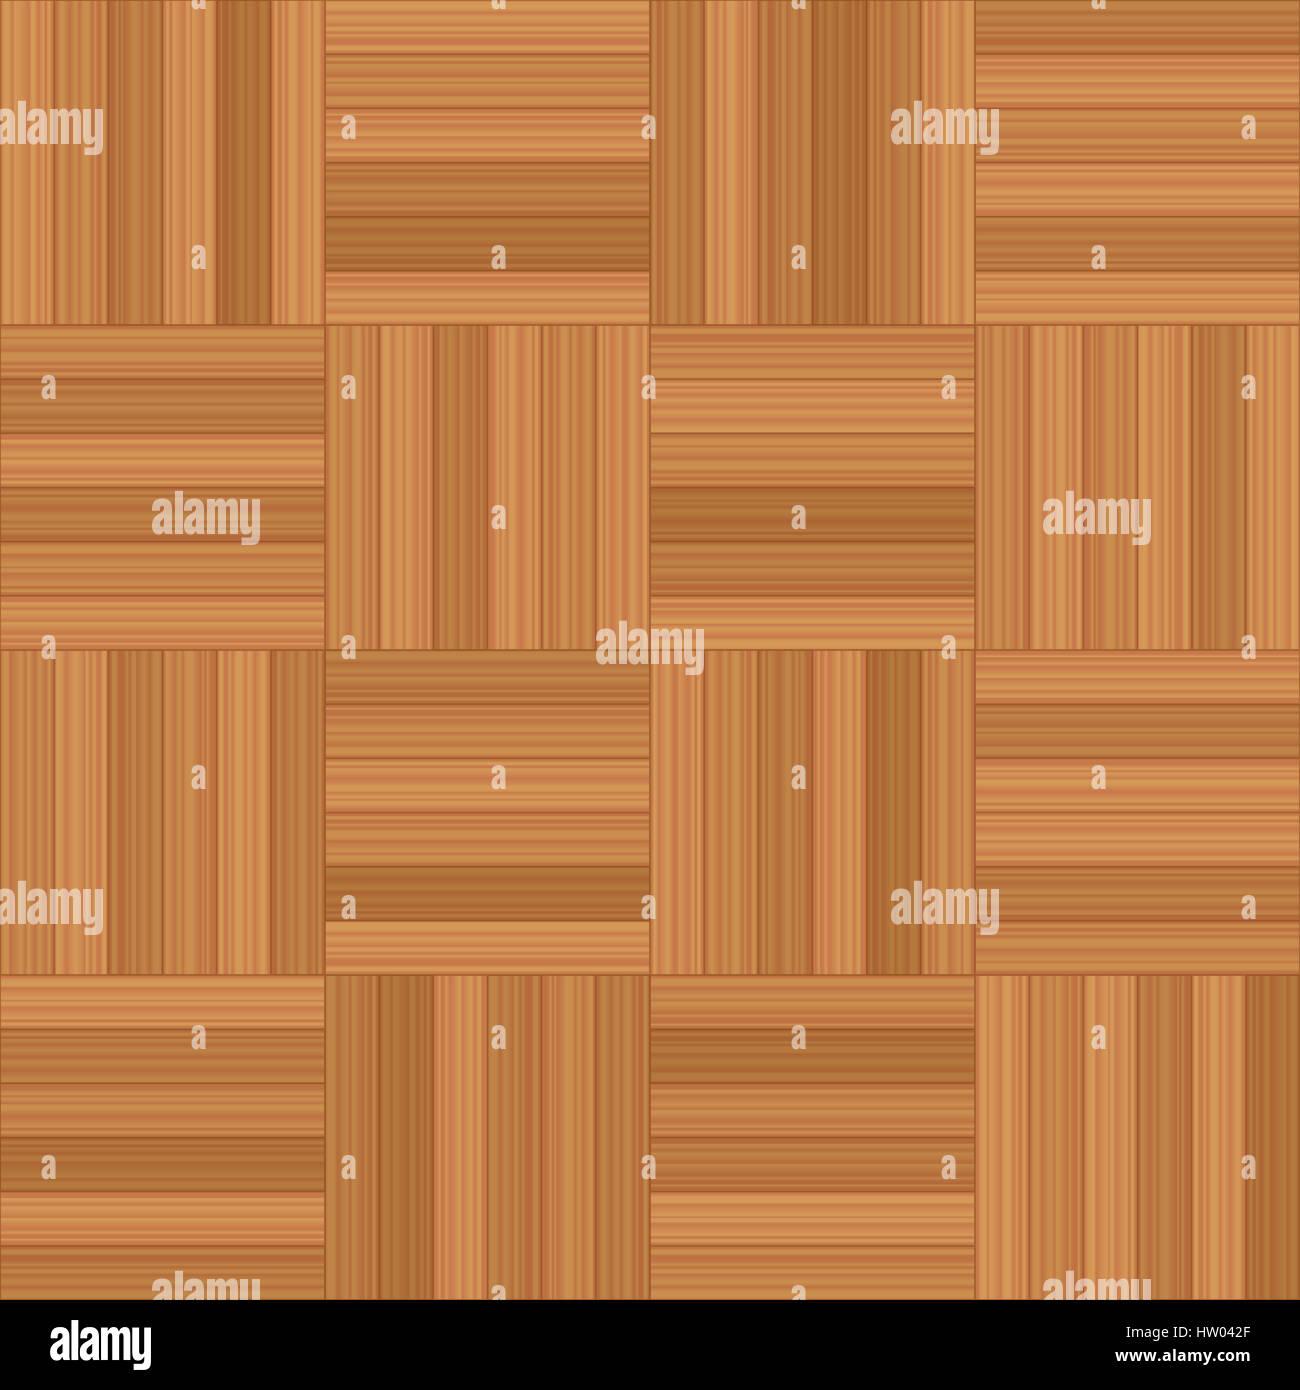 Mosaic Parquet Illustration Of Square Wooden Floor Pattern Stock